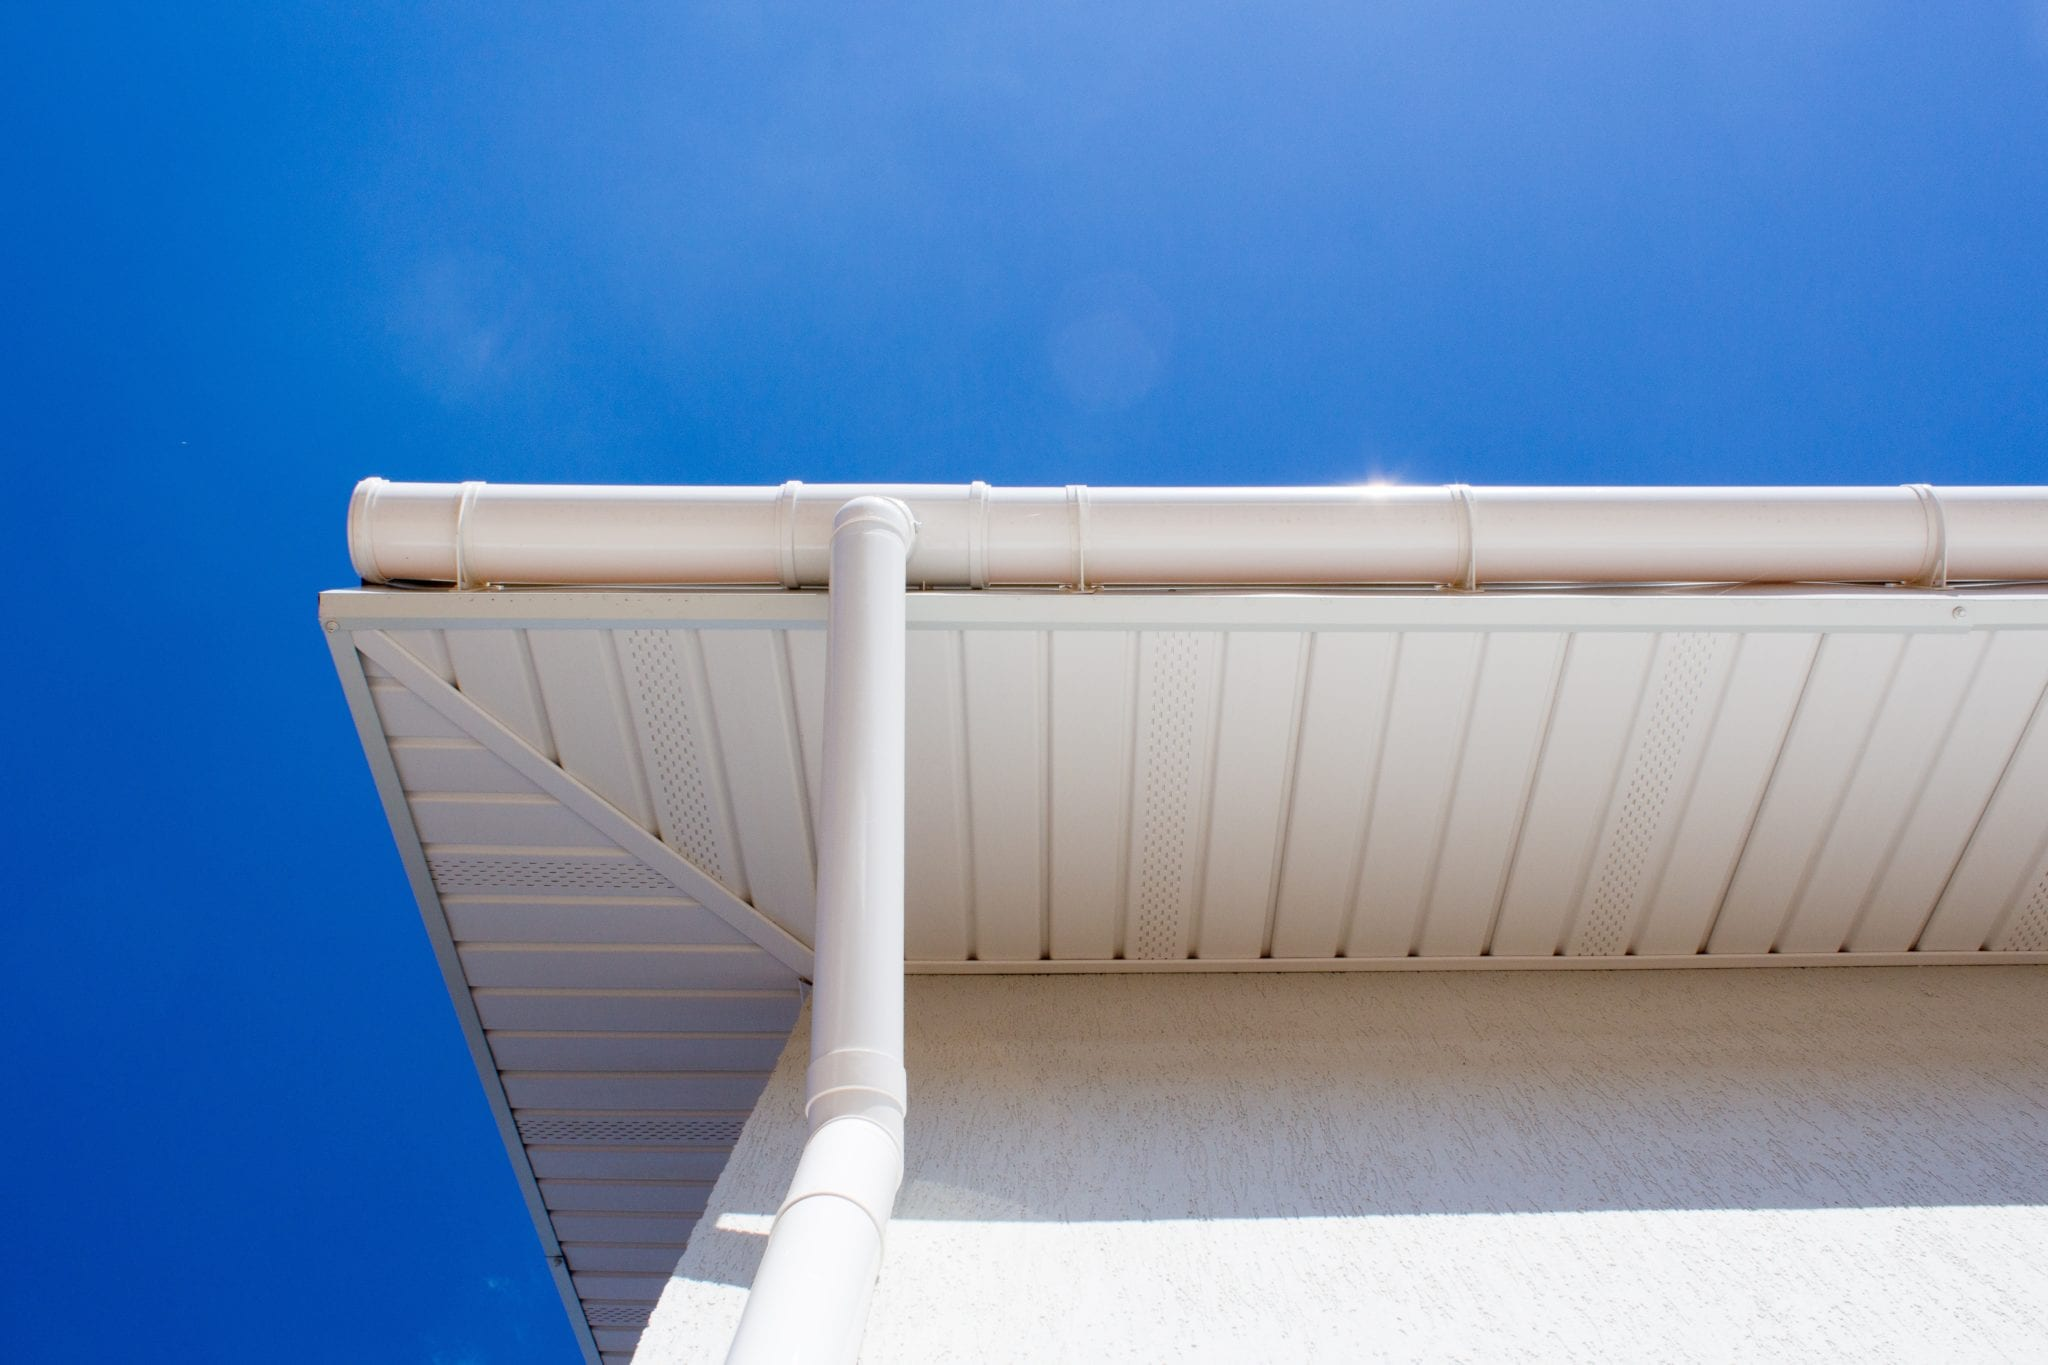 Roof Drainage